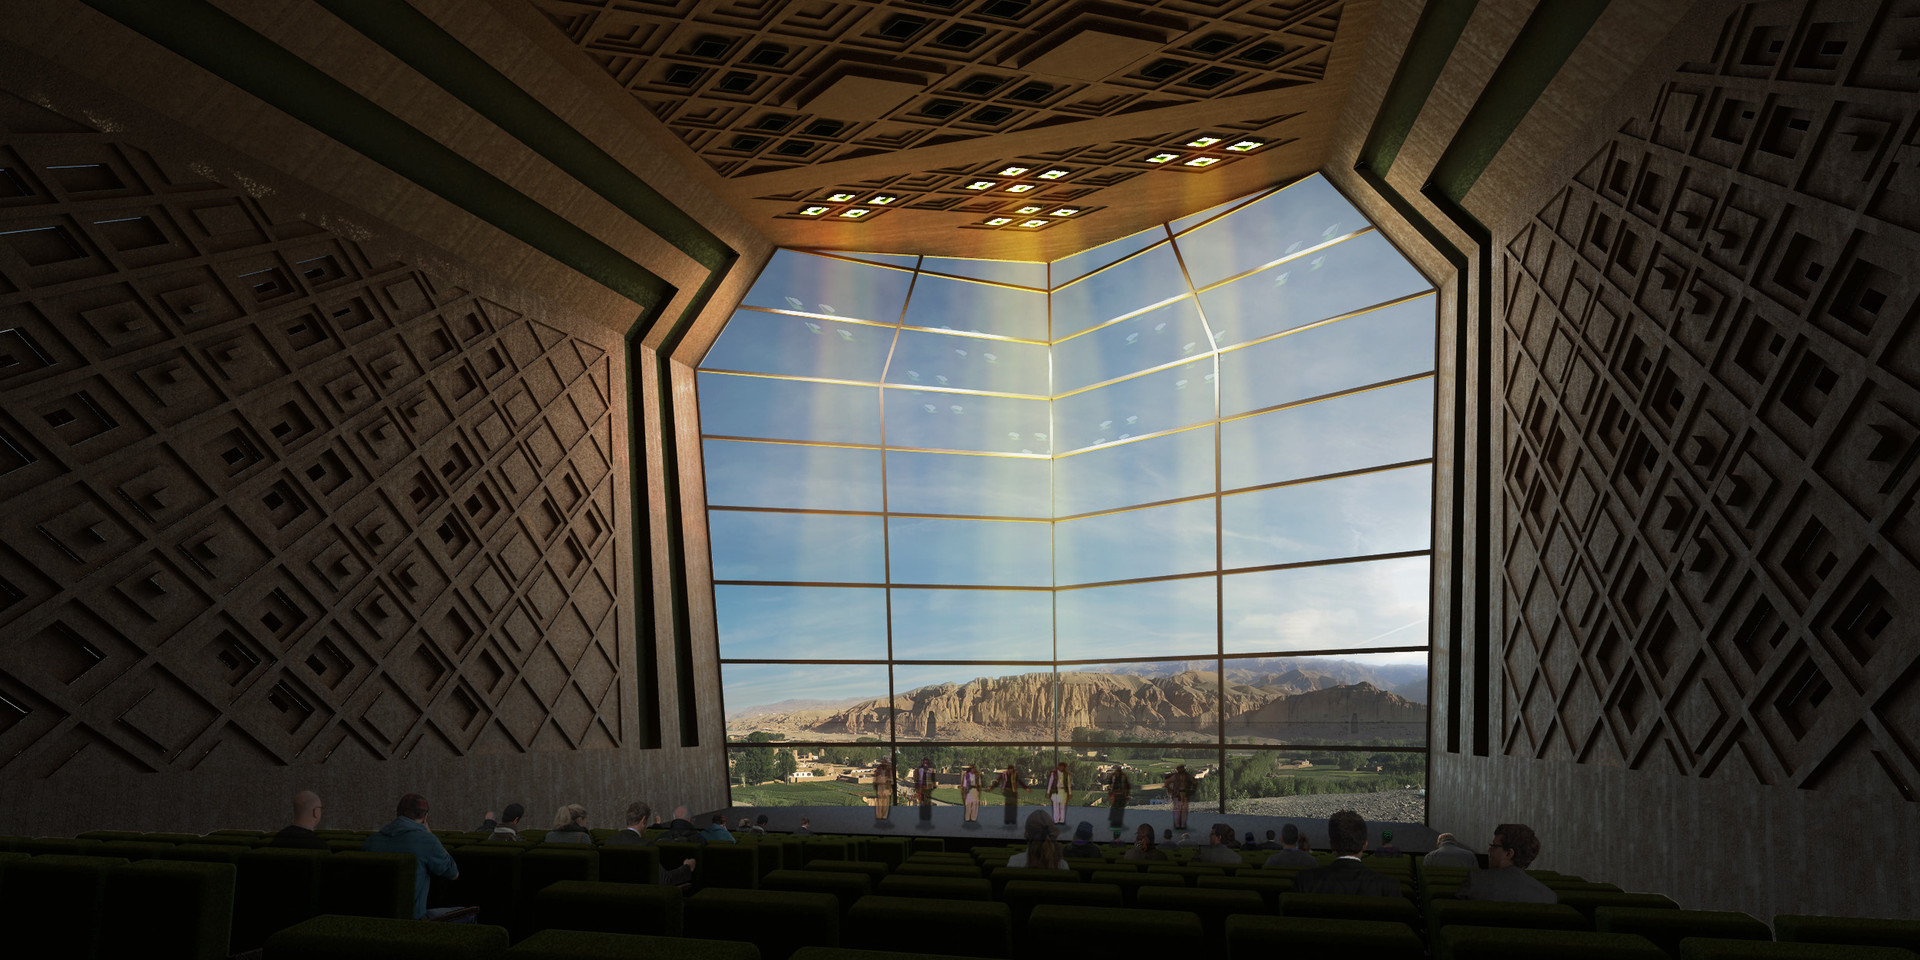 Bamiyan Cultural Center Performance Hall Perspective